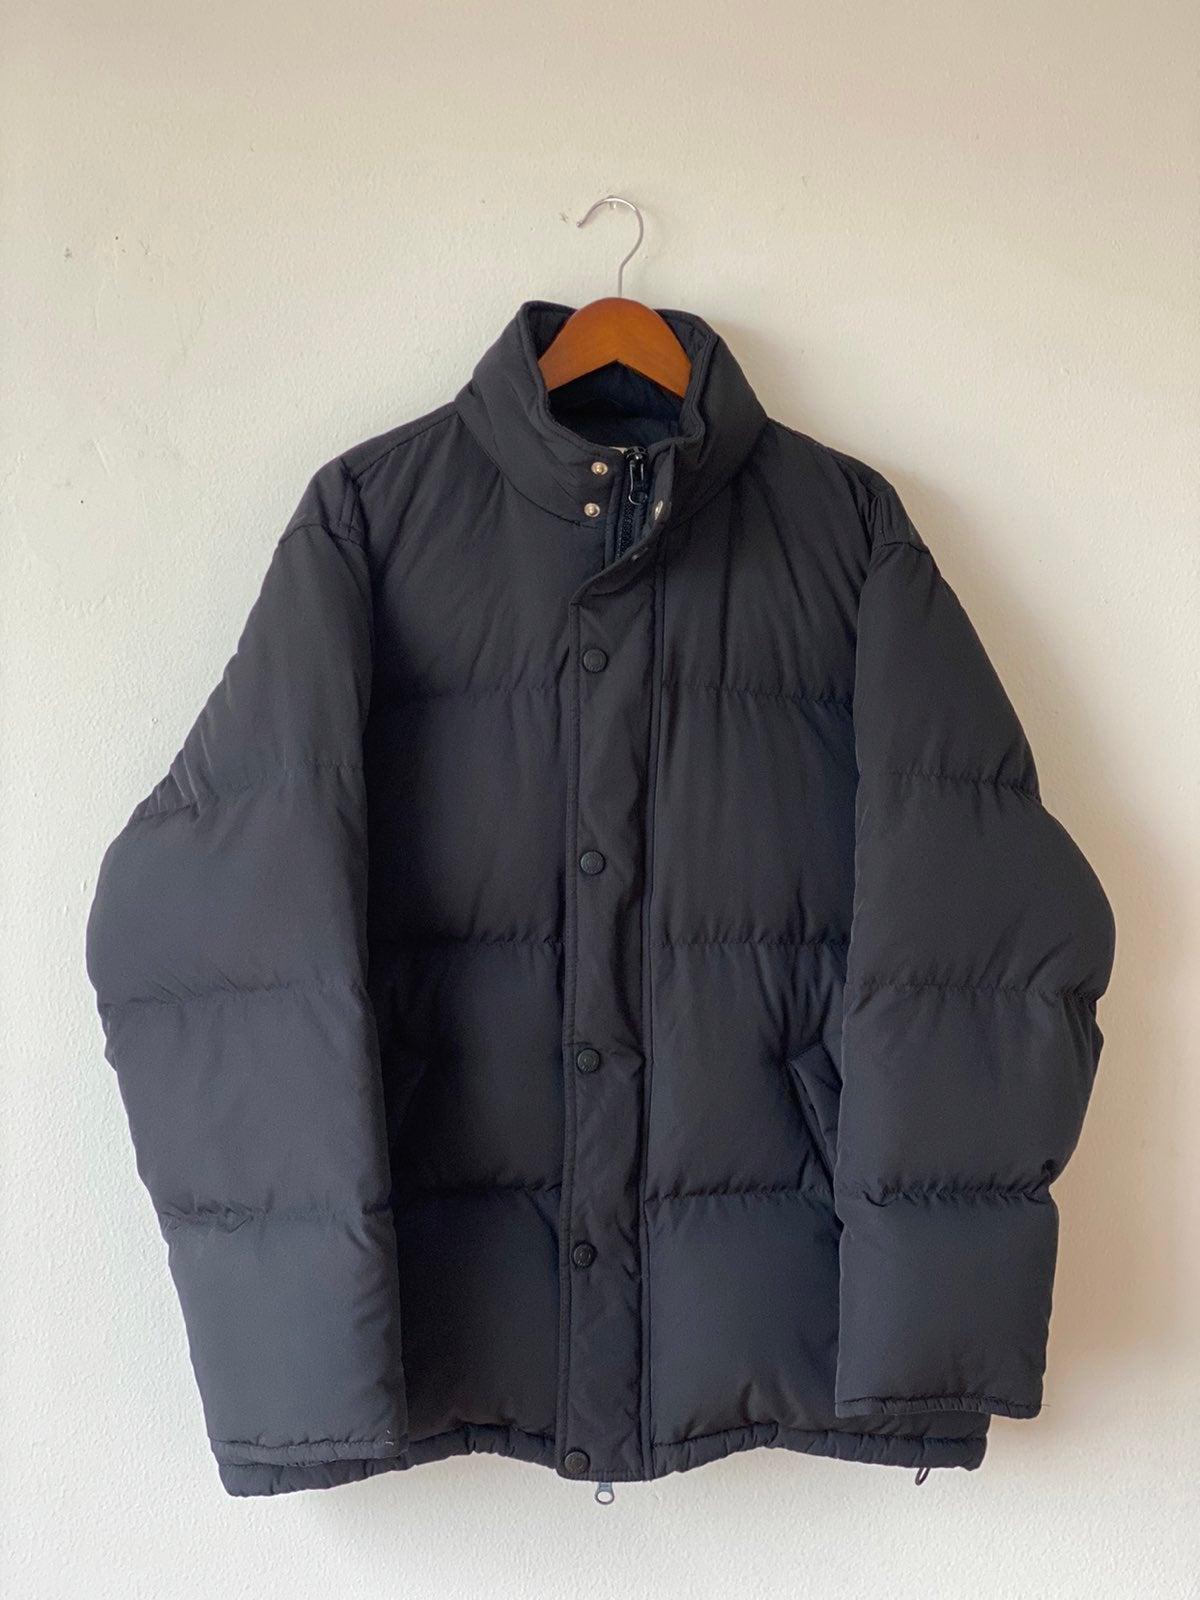 J. Crew Puffer Jacket Sz M